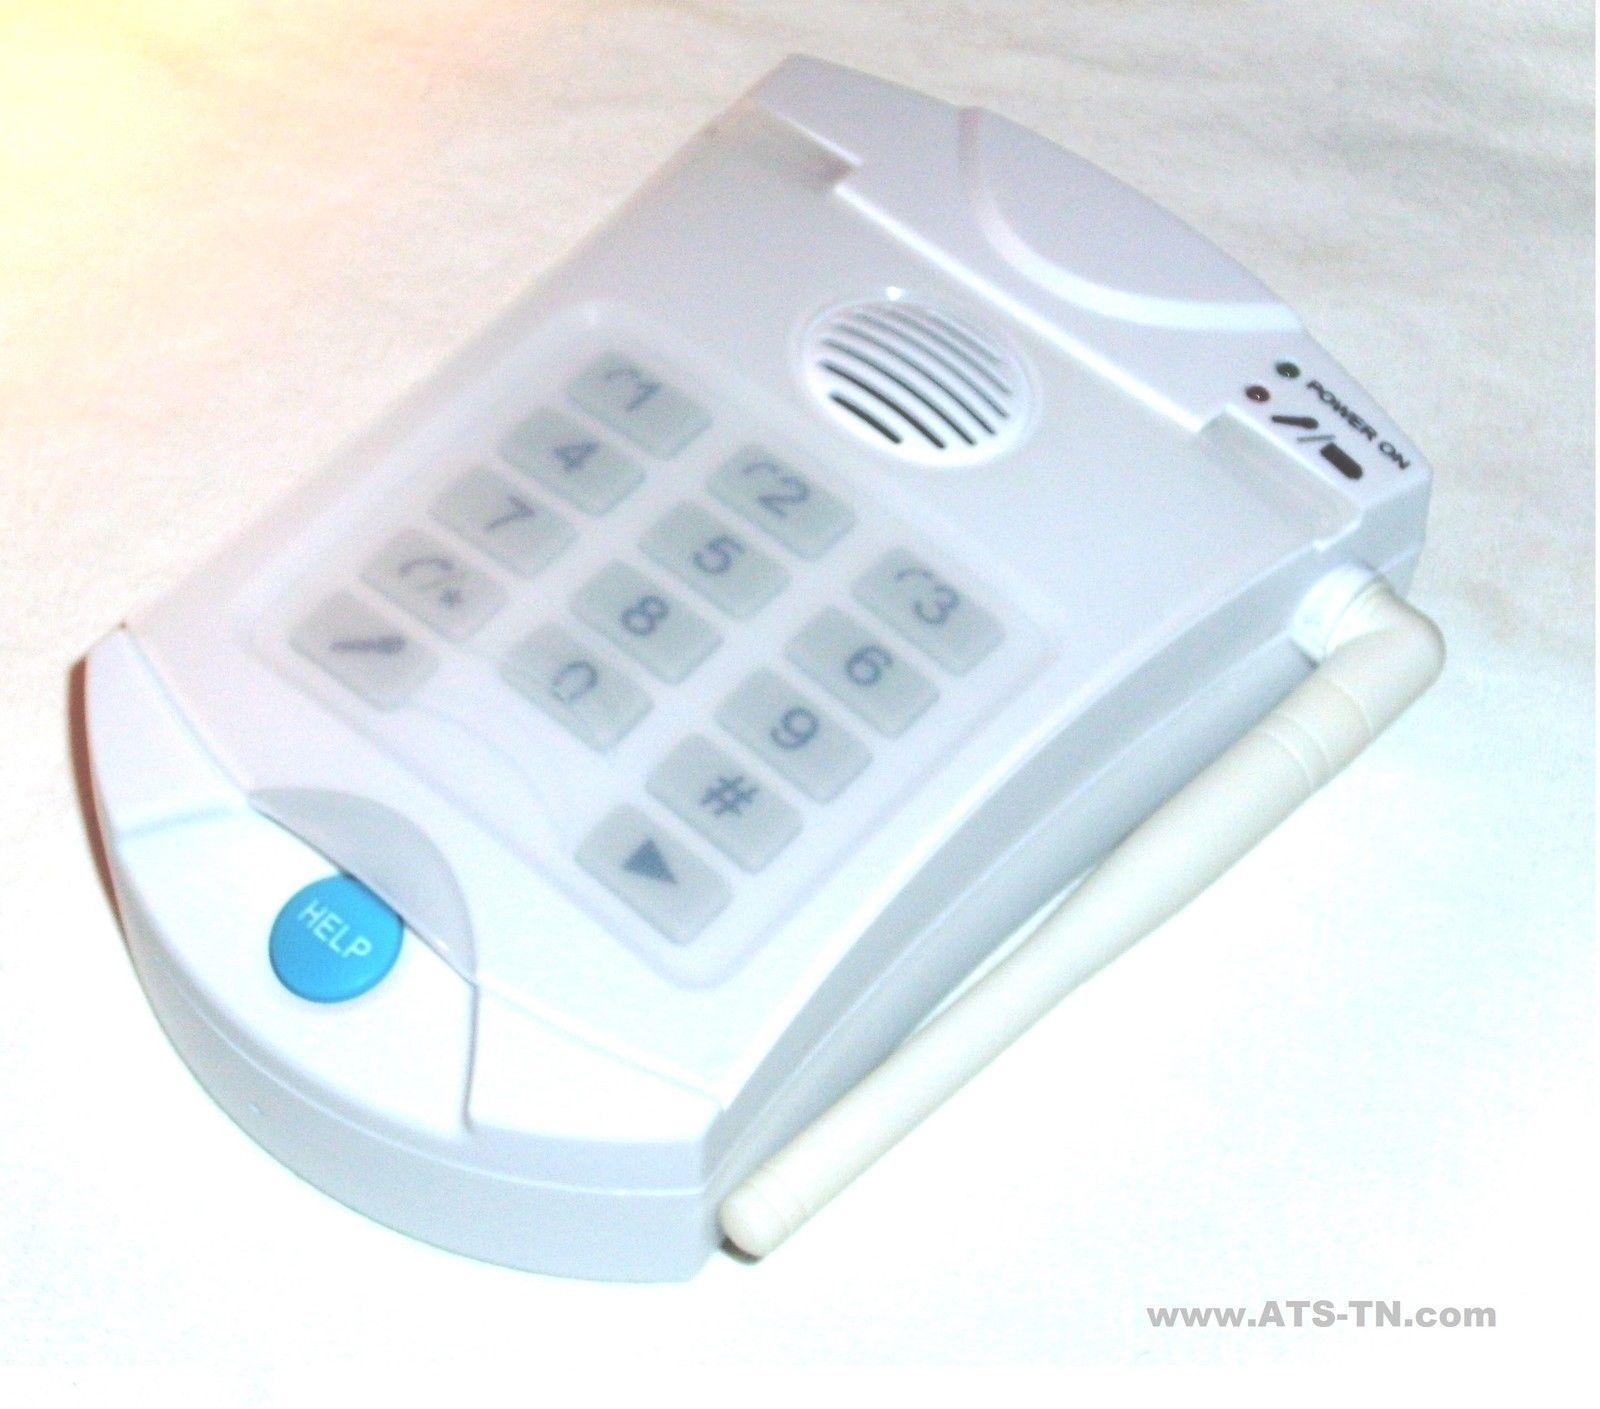 Best Life Guardian Medical Alert Alarm 911 Alert Phone